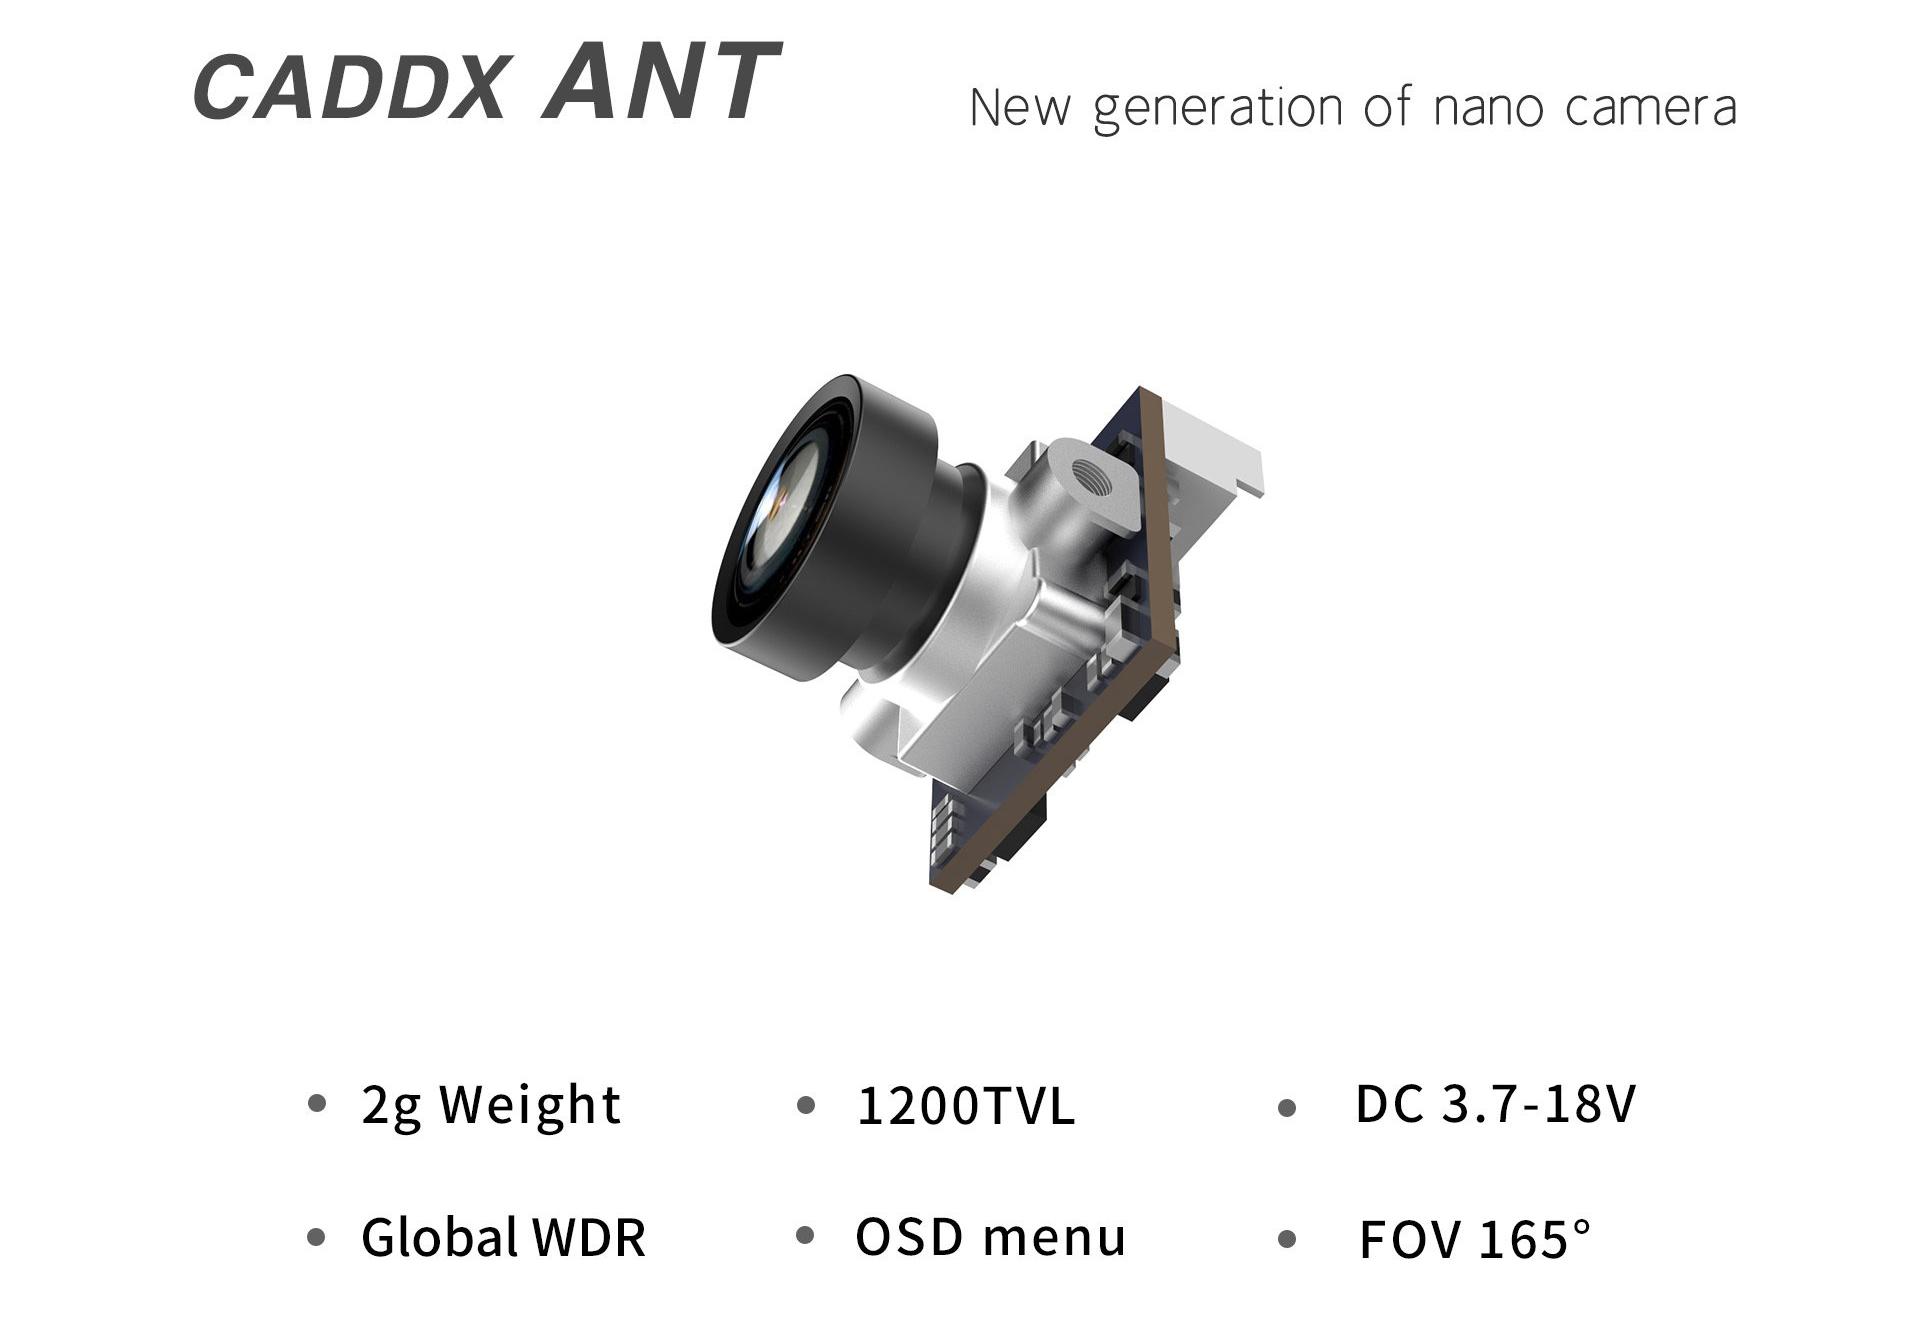 Caddx Ant